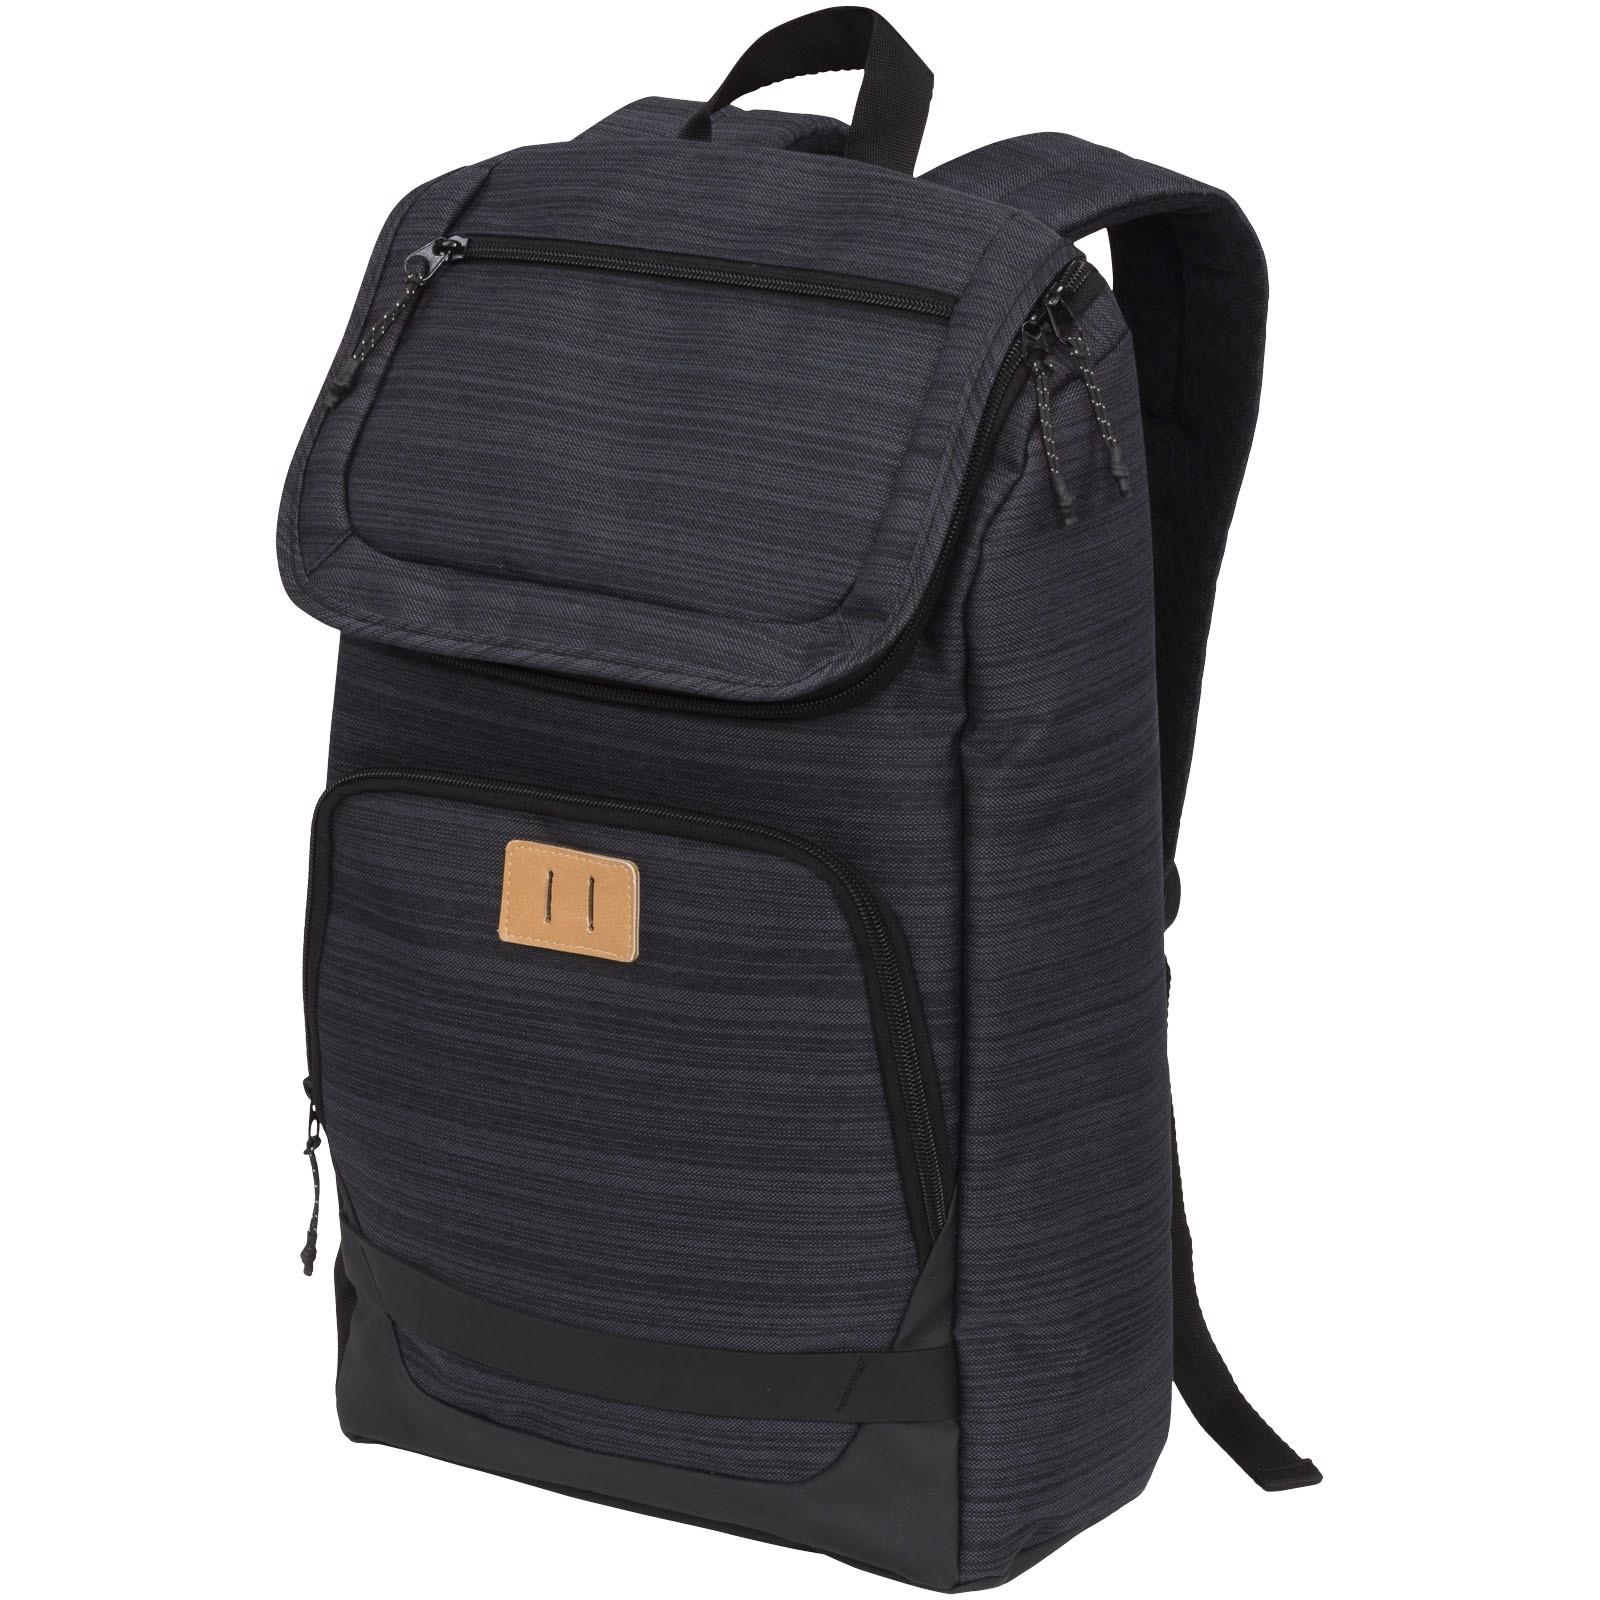 "Graylin 15"" laptop backpack"